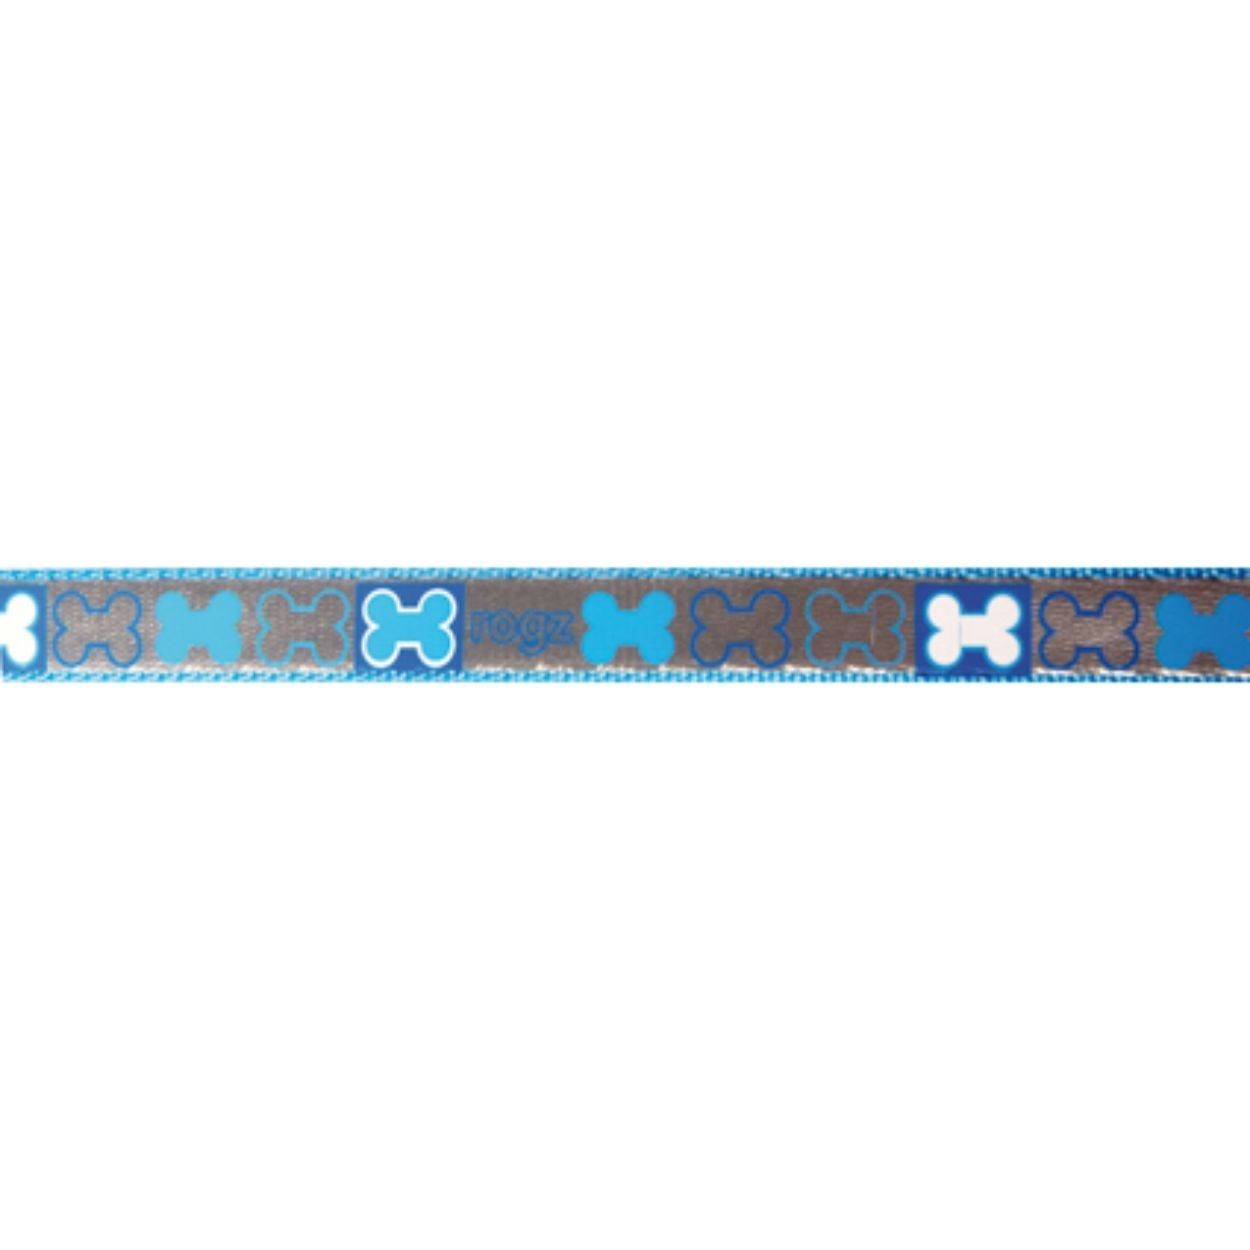 Rogz Reflecto - Hundeleine reflektierend, blau - 180 cm x 8 mm